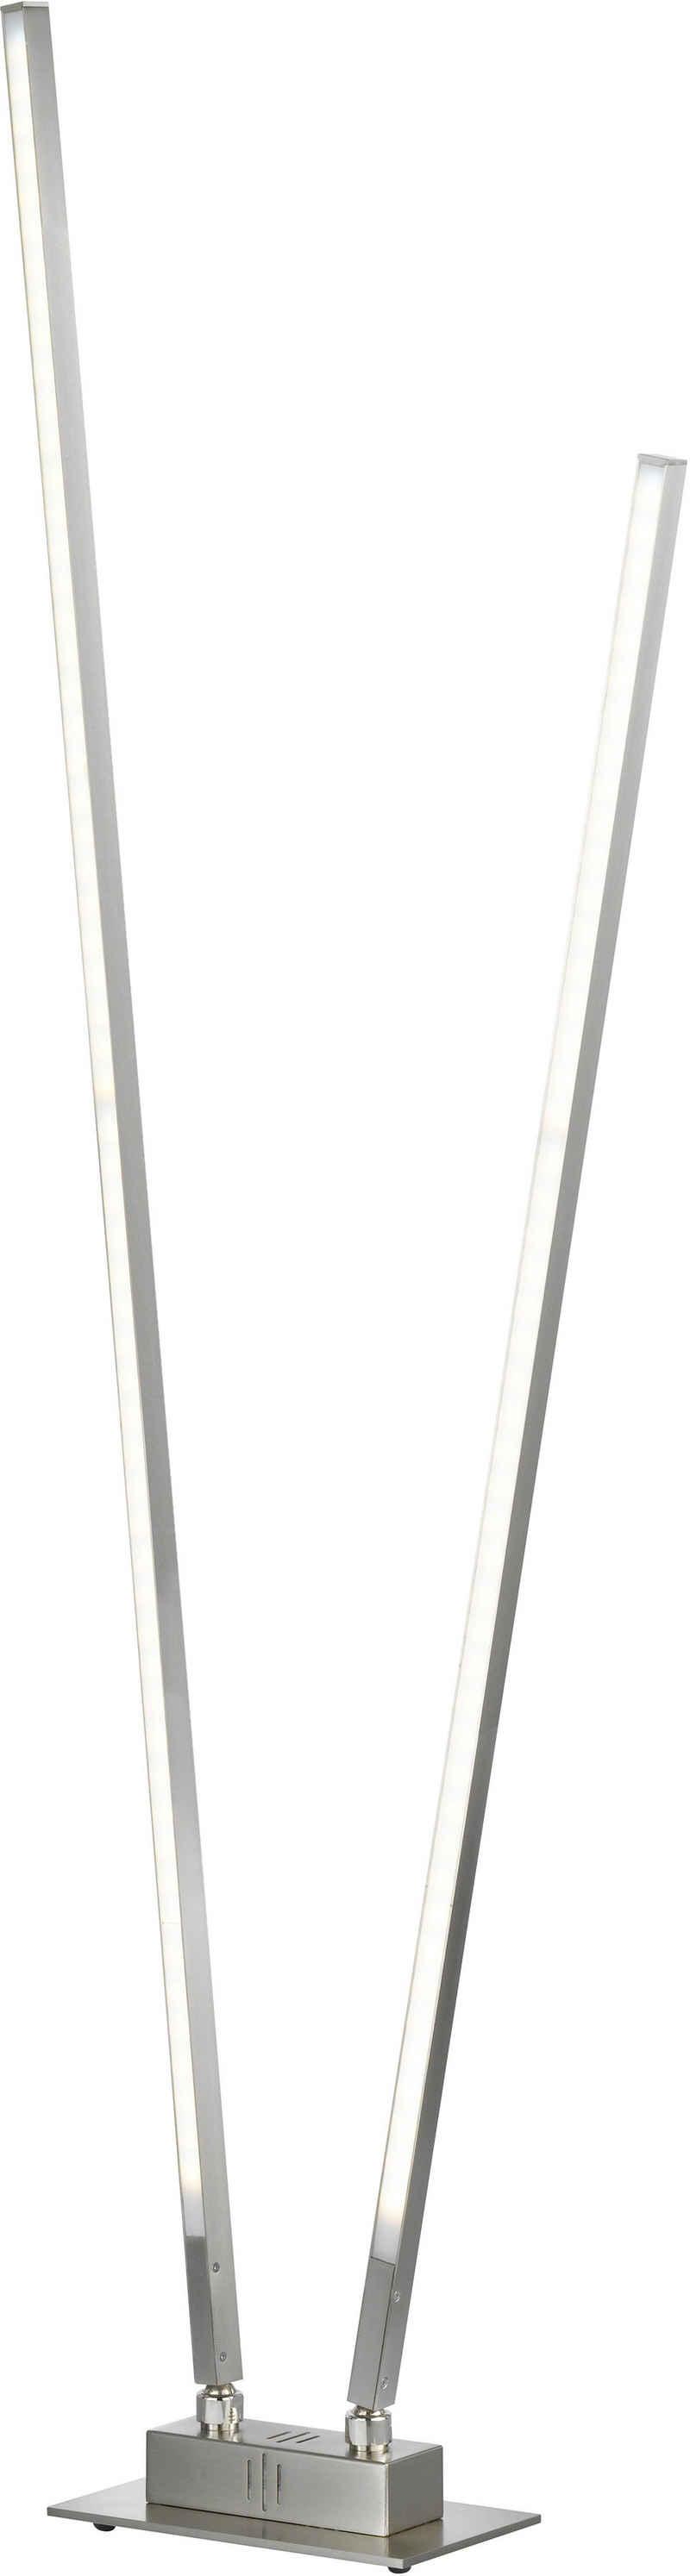 FISCHER & HONSEL LED Stehlampe »Carla Zig«